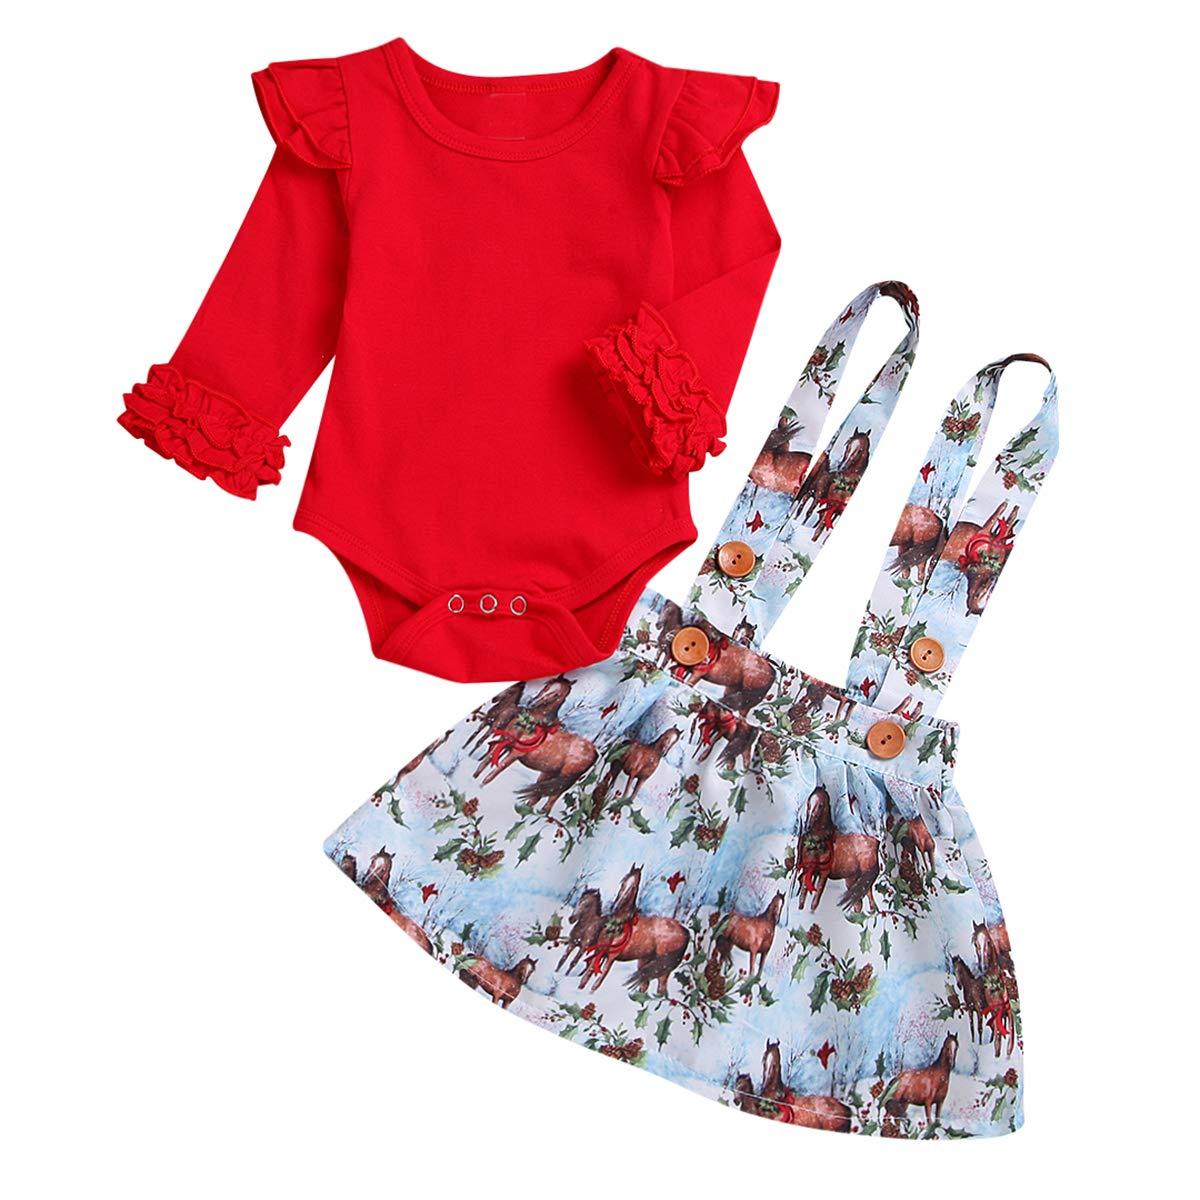 Newborn Baby Girls Ruffle Long Sleeve Romper Jumpsuit Horse Suspender Skirt Overalls Outfits Set